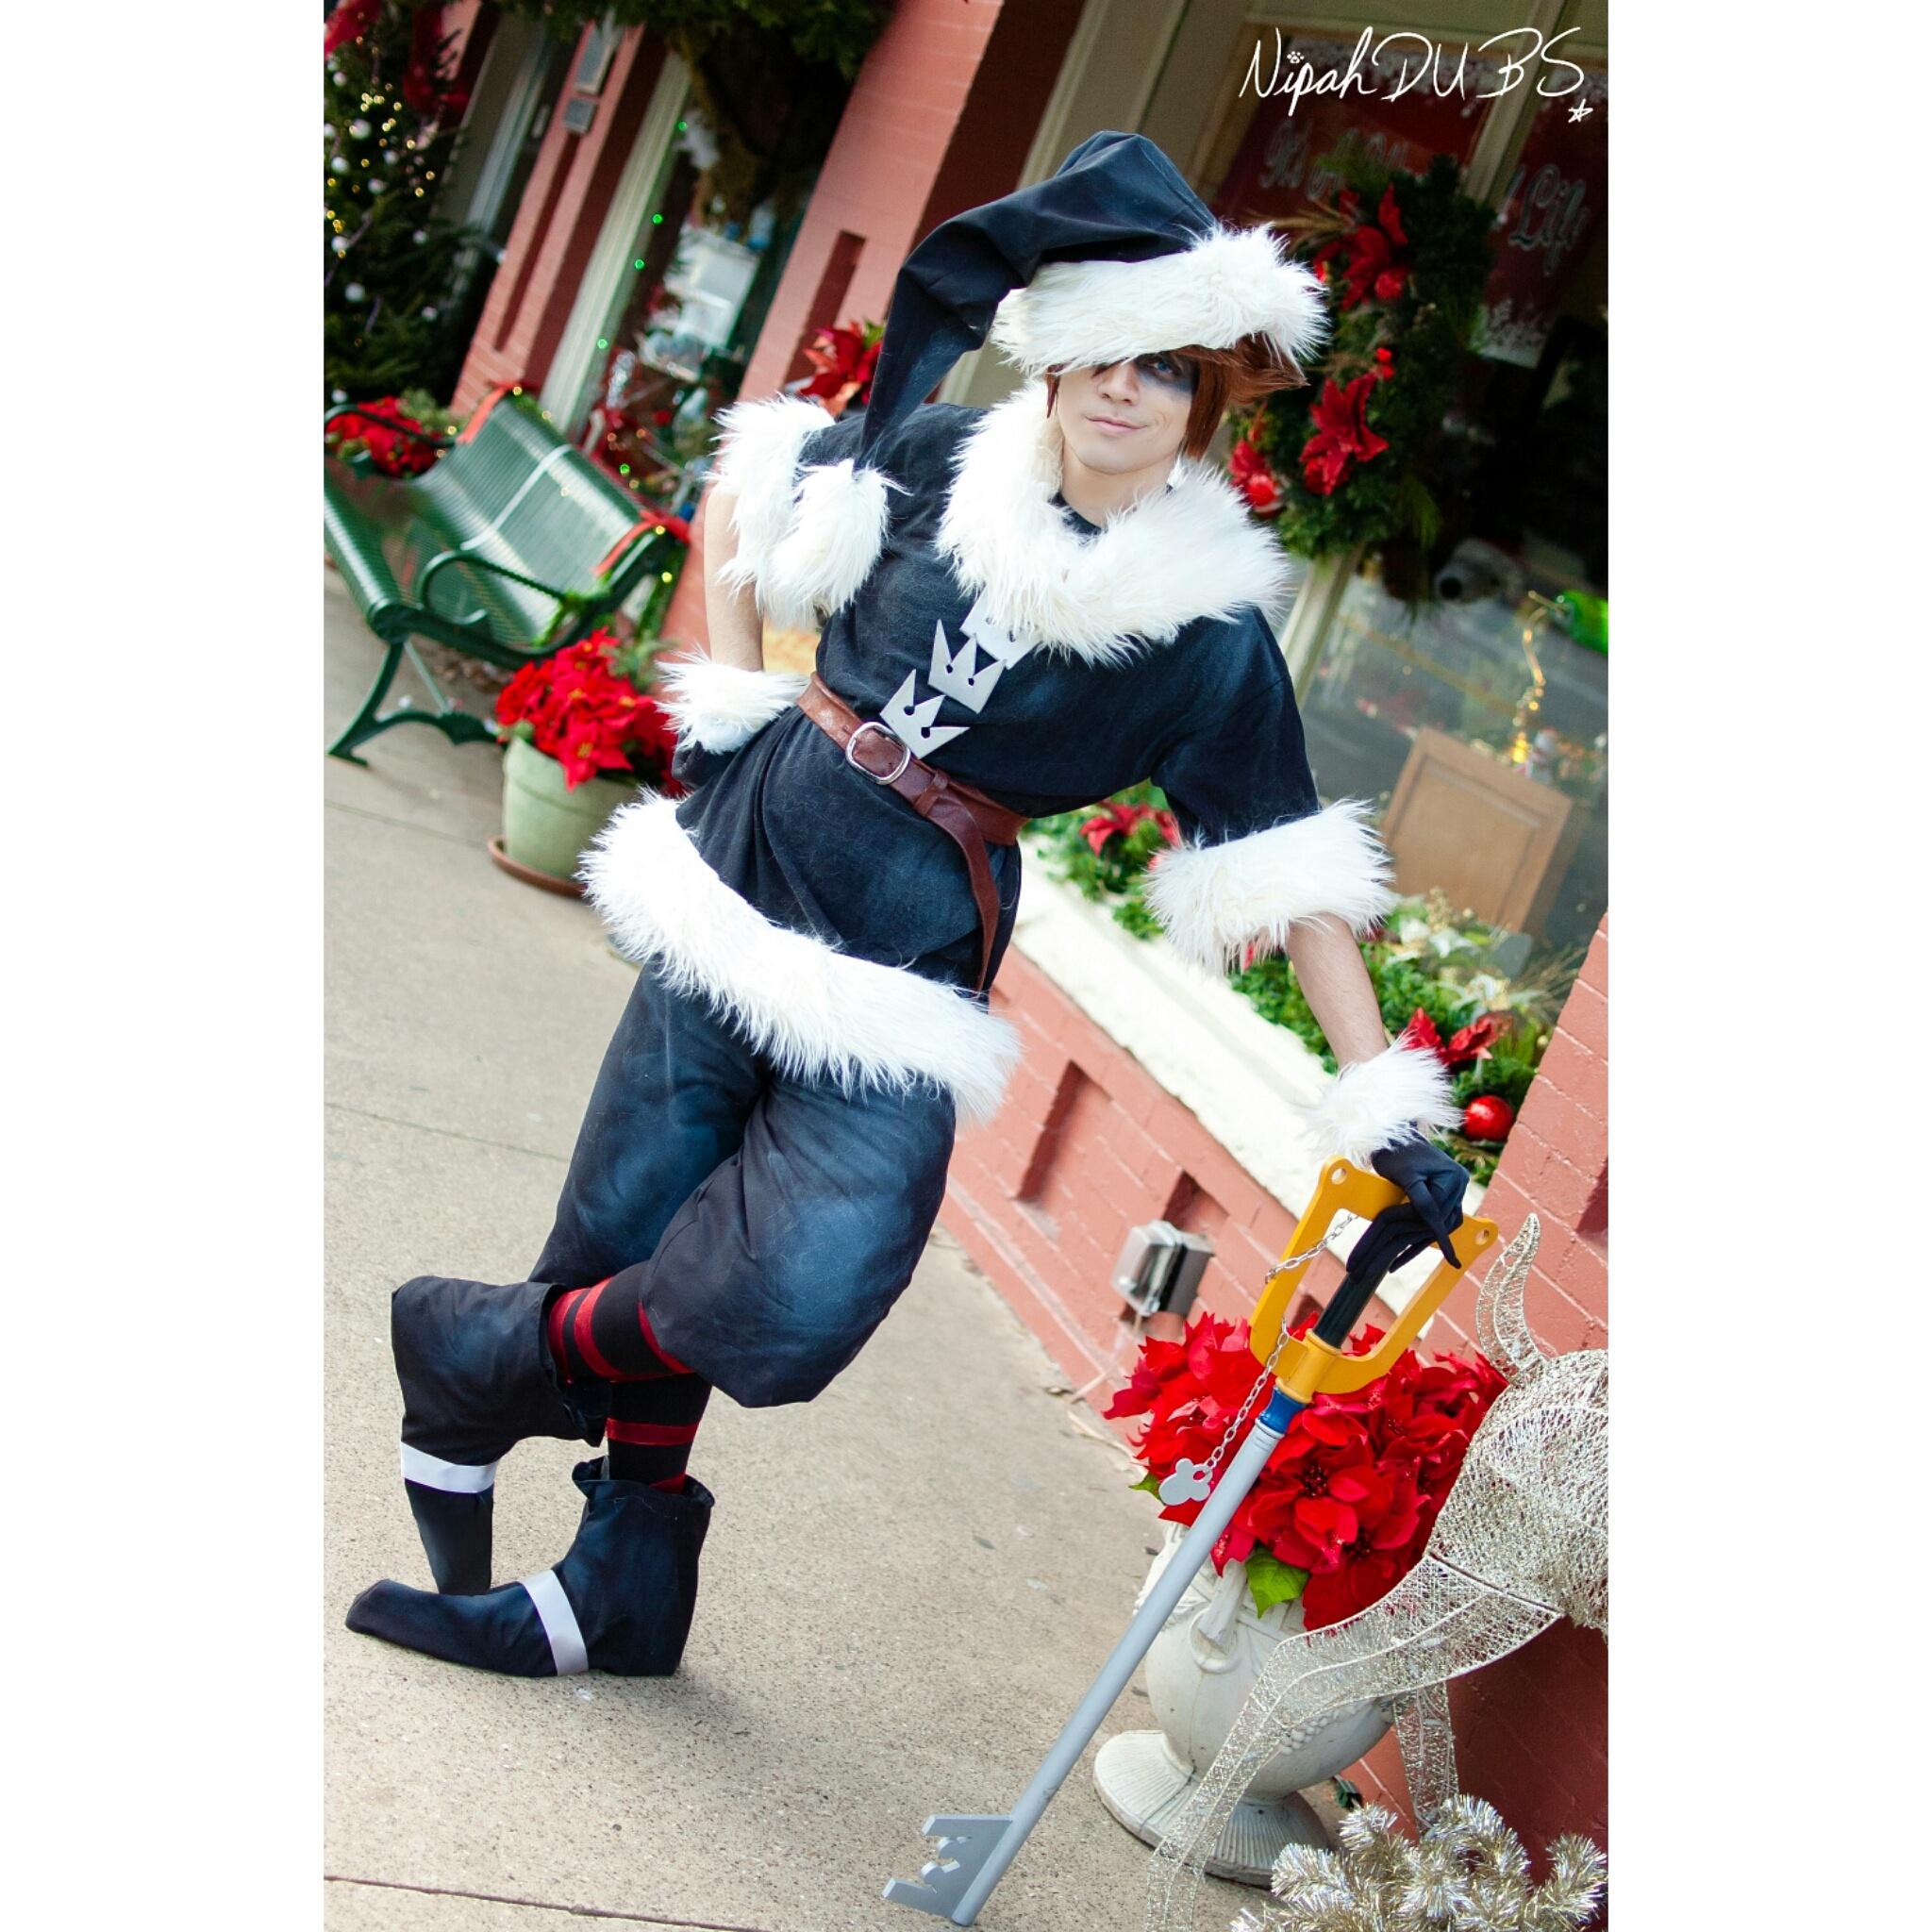 Sora Christmas Town Cosplay.Christmas Town Sora Kingdom Hearts Print From Nipahdubs